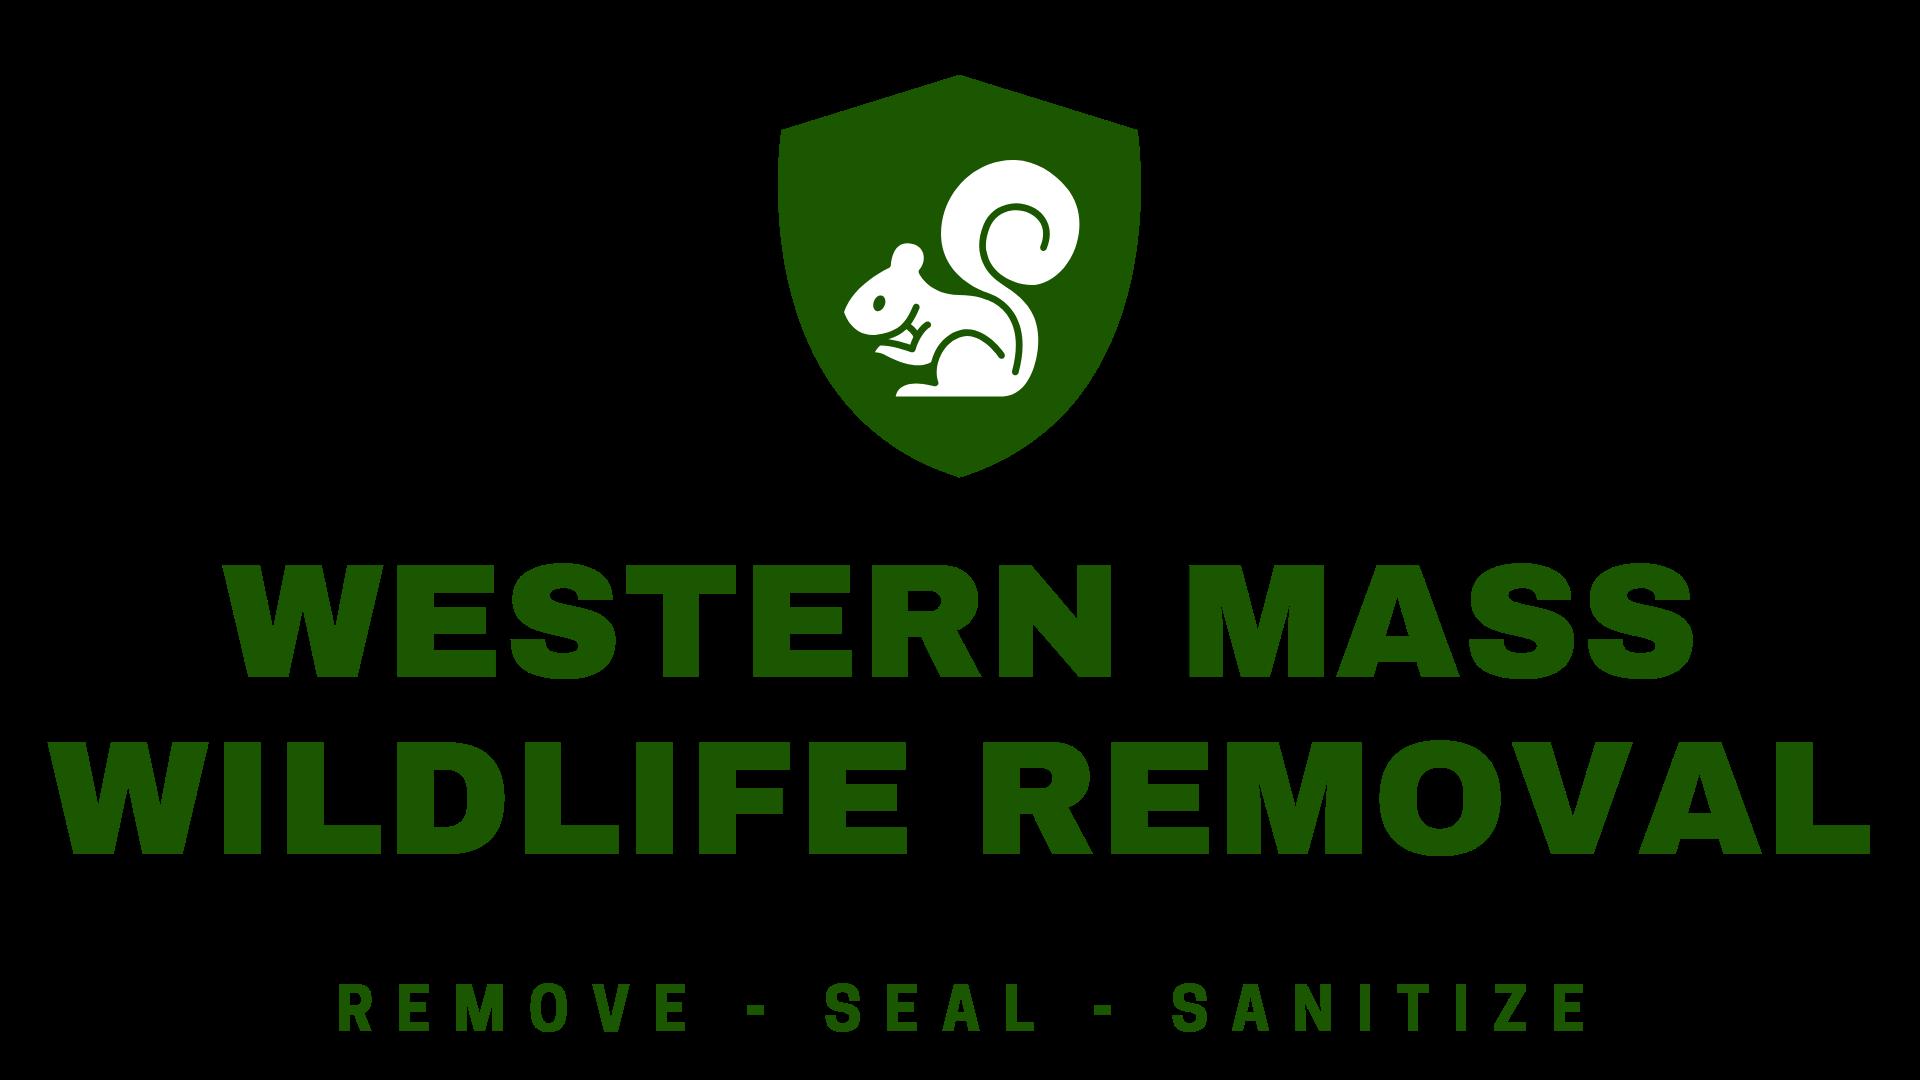 Western Mass Wildlife Removal